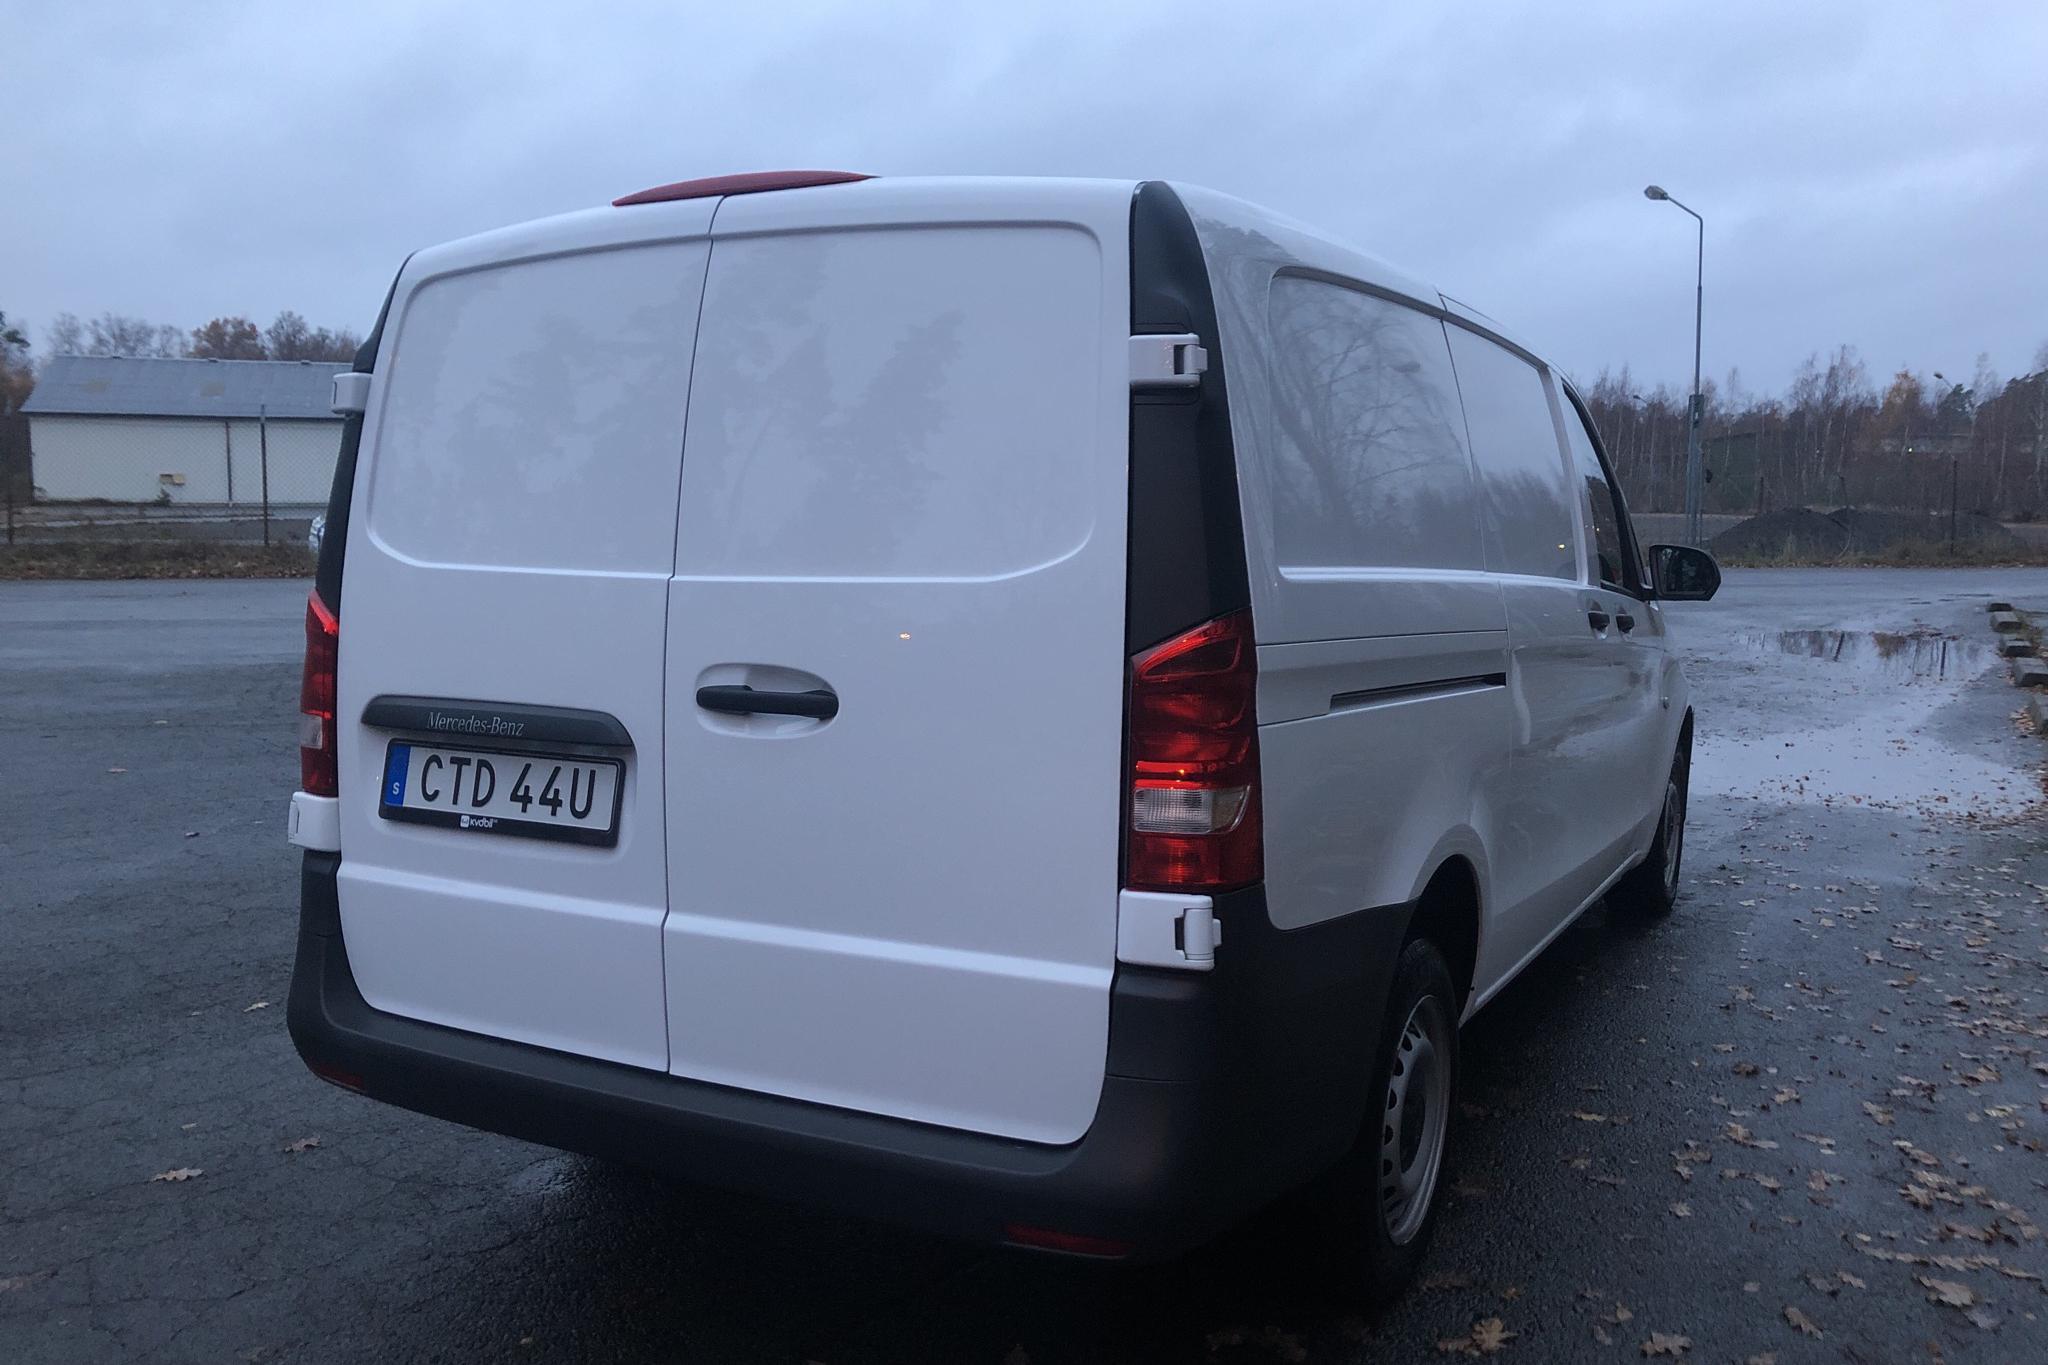 Mercedes Vito 111 CDI W640 (114hk) - 38 680 km - Manual - white - 2018